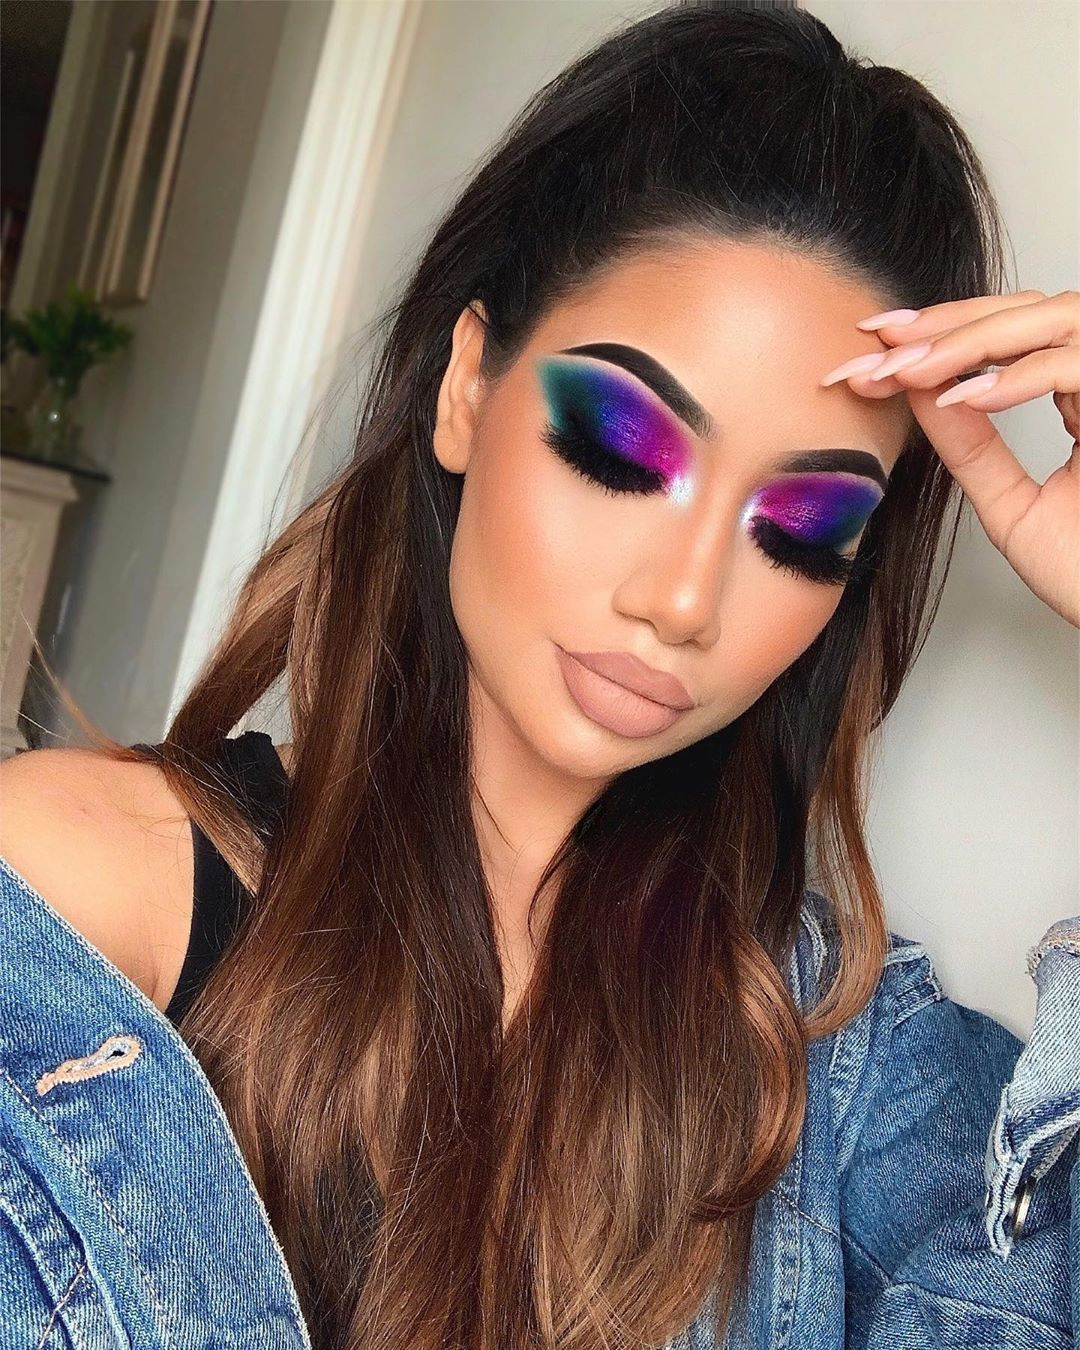 Kimi Fashion: 11 tips de maquillaje de ojos que amarás